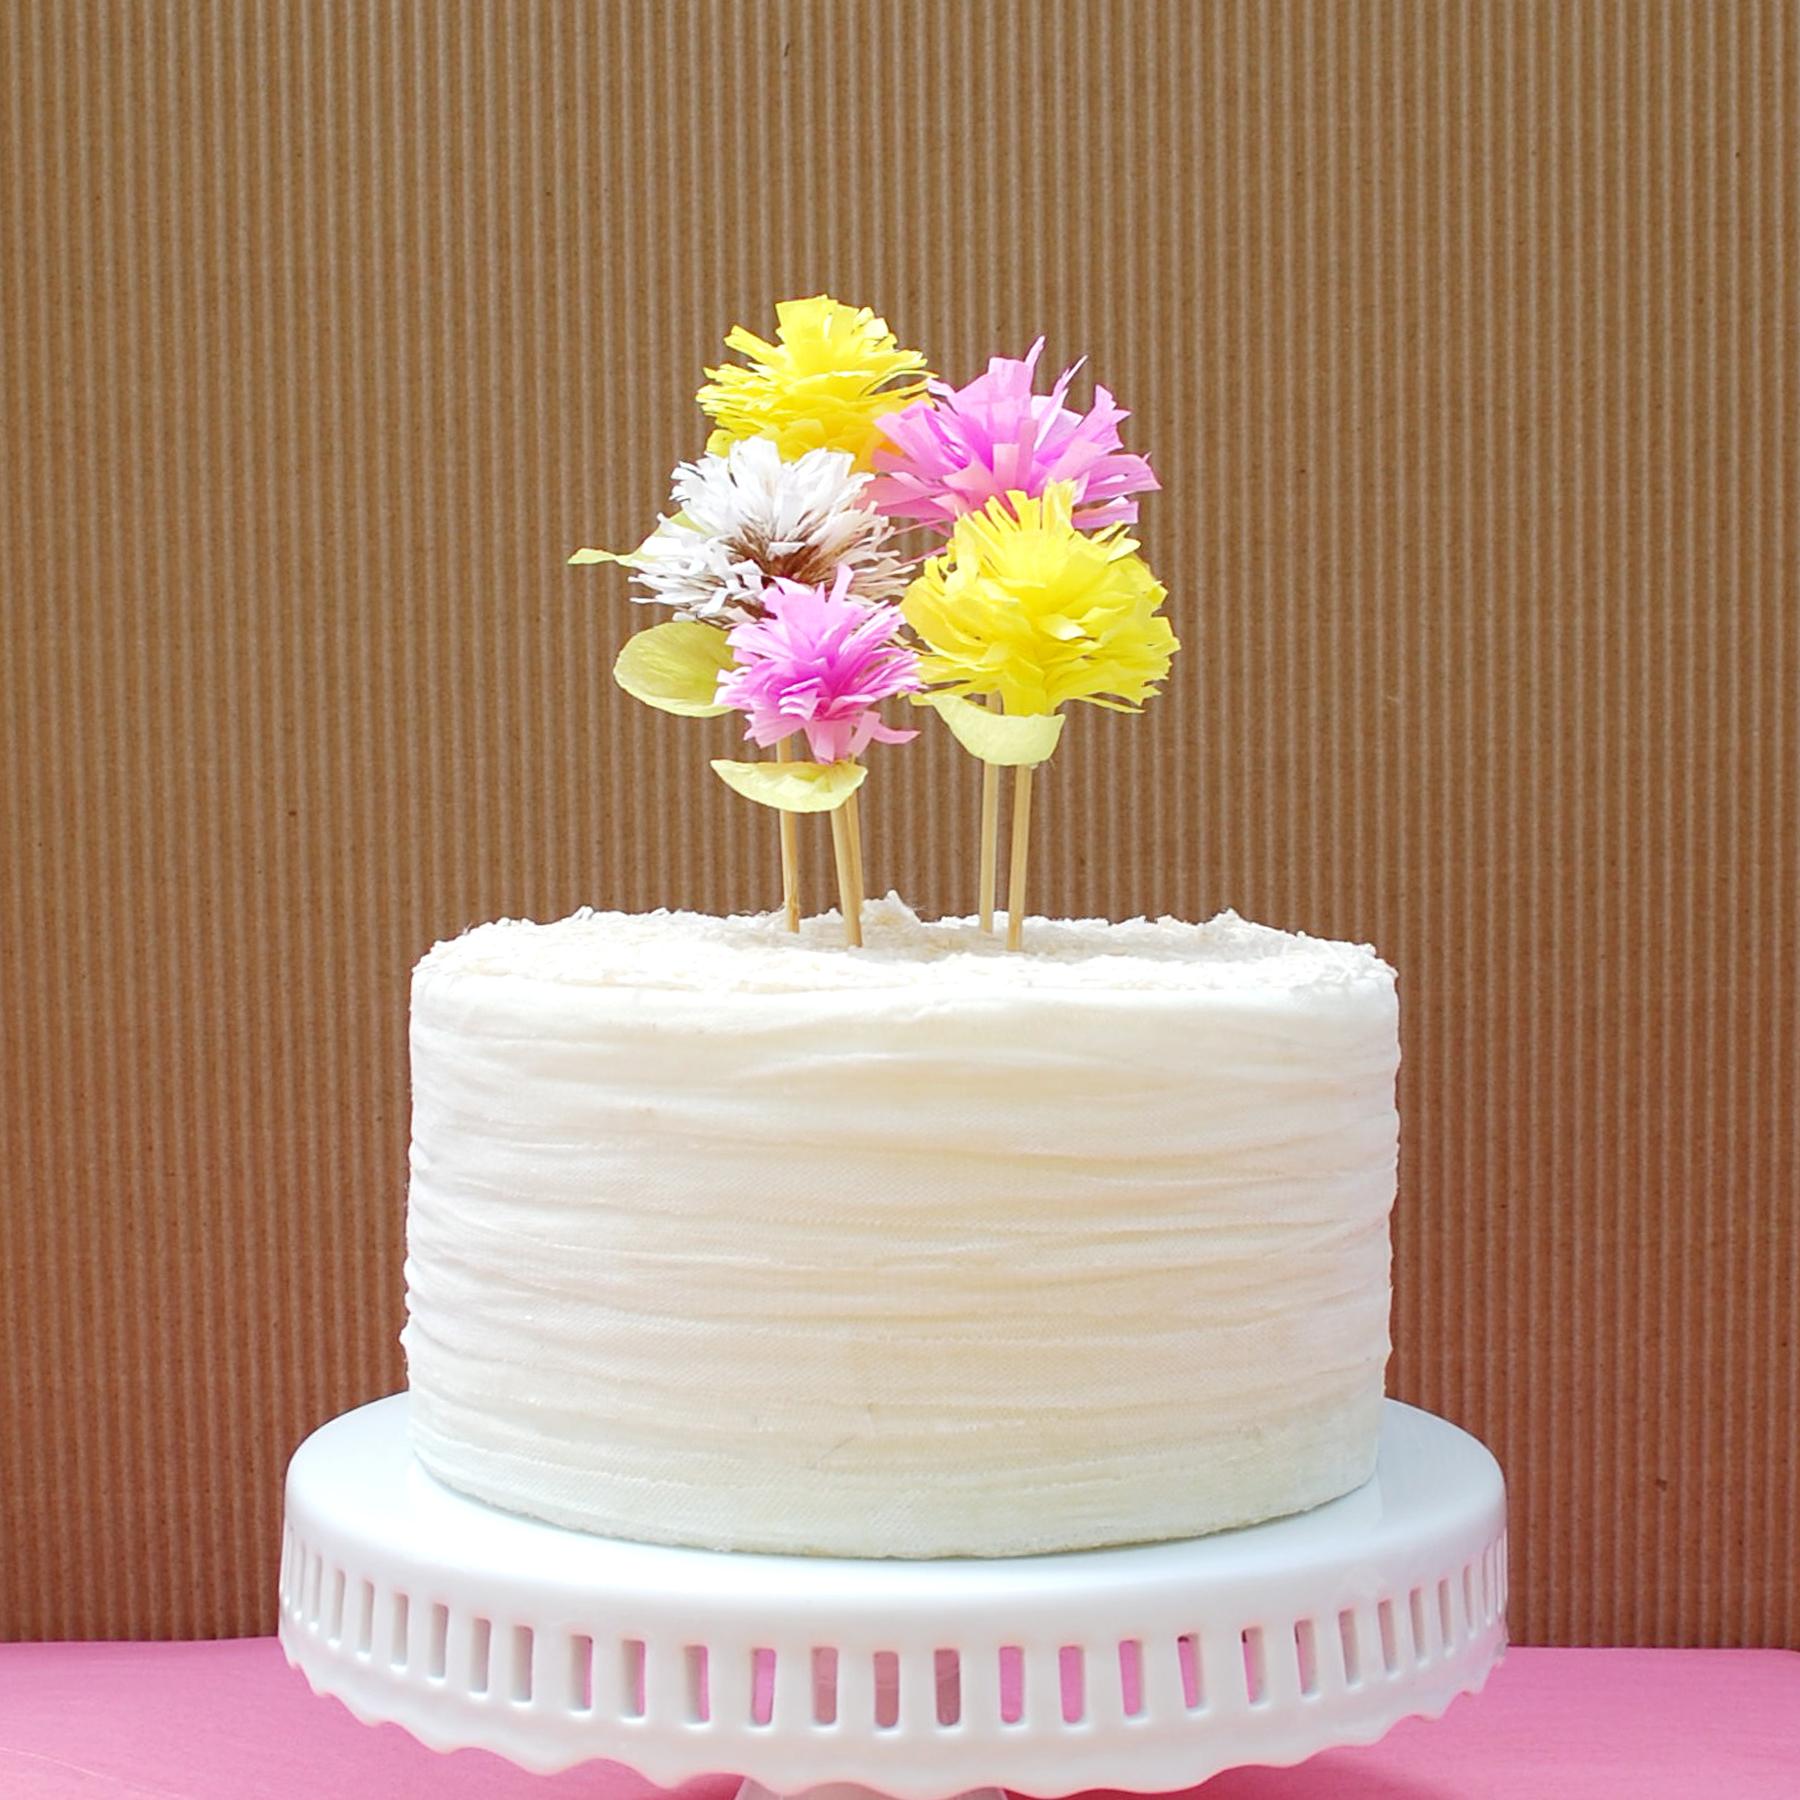 Crepe-Paper-Flower-Cake-Toppers-02.jpg